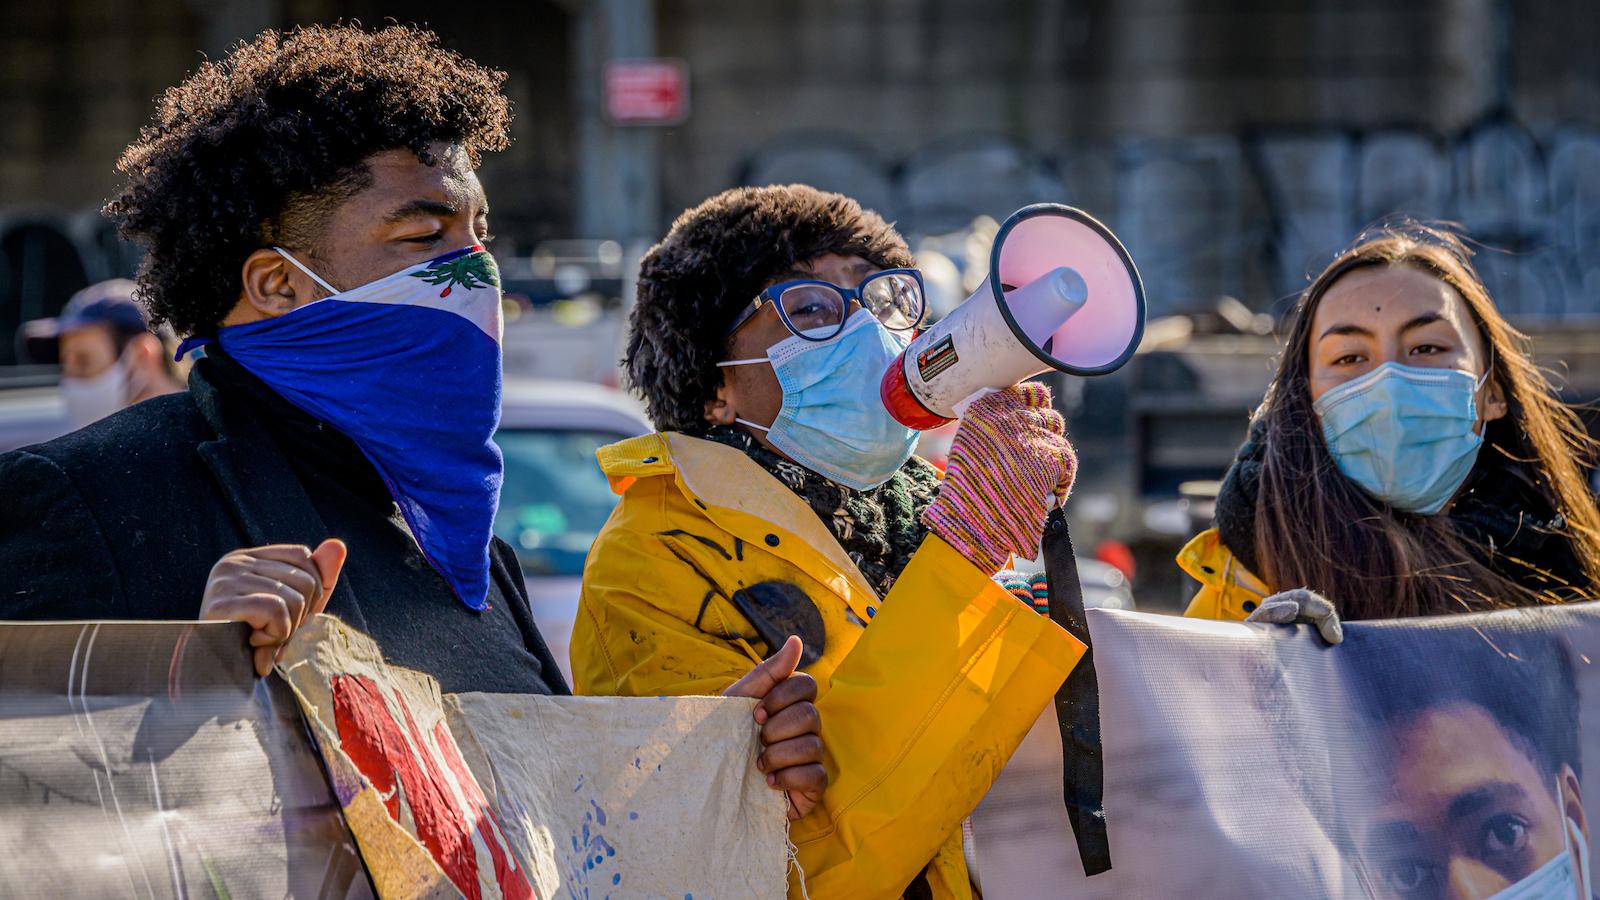 Protestors speak out against National Grid's pipeline.